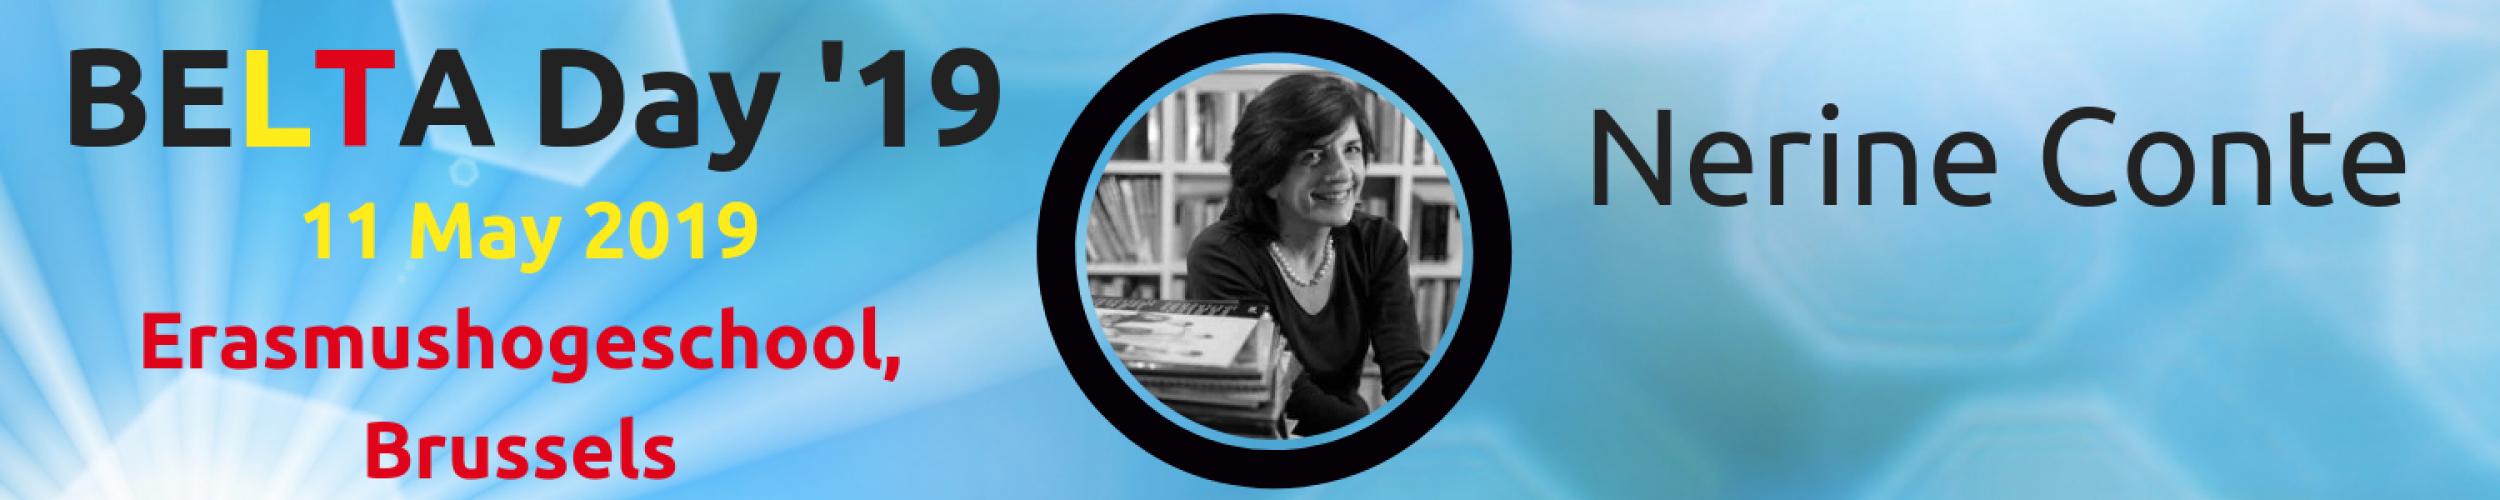 BELTA Day '19: Meet the Speakers: Nerina Conte